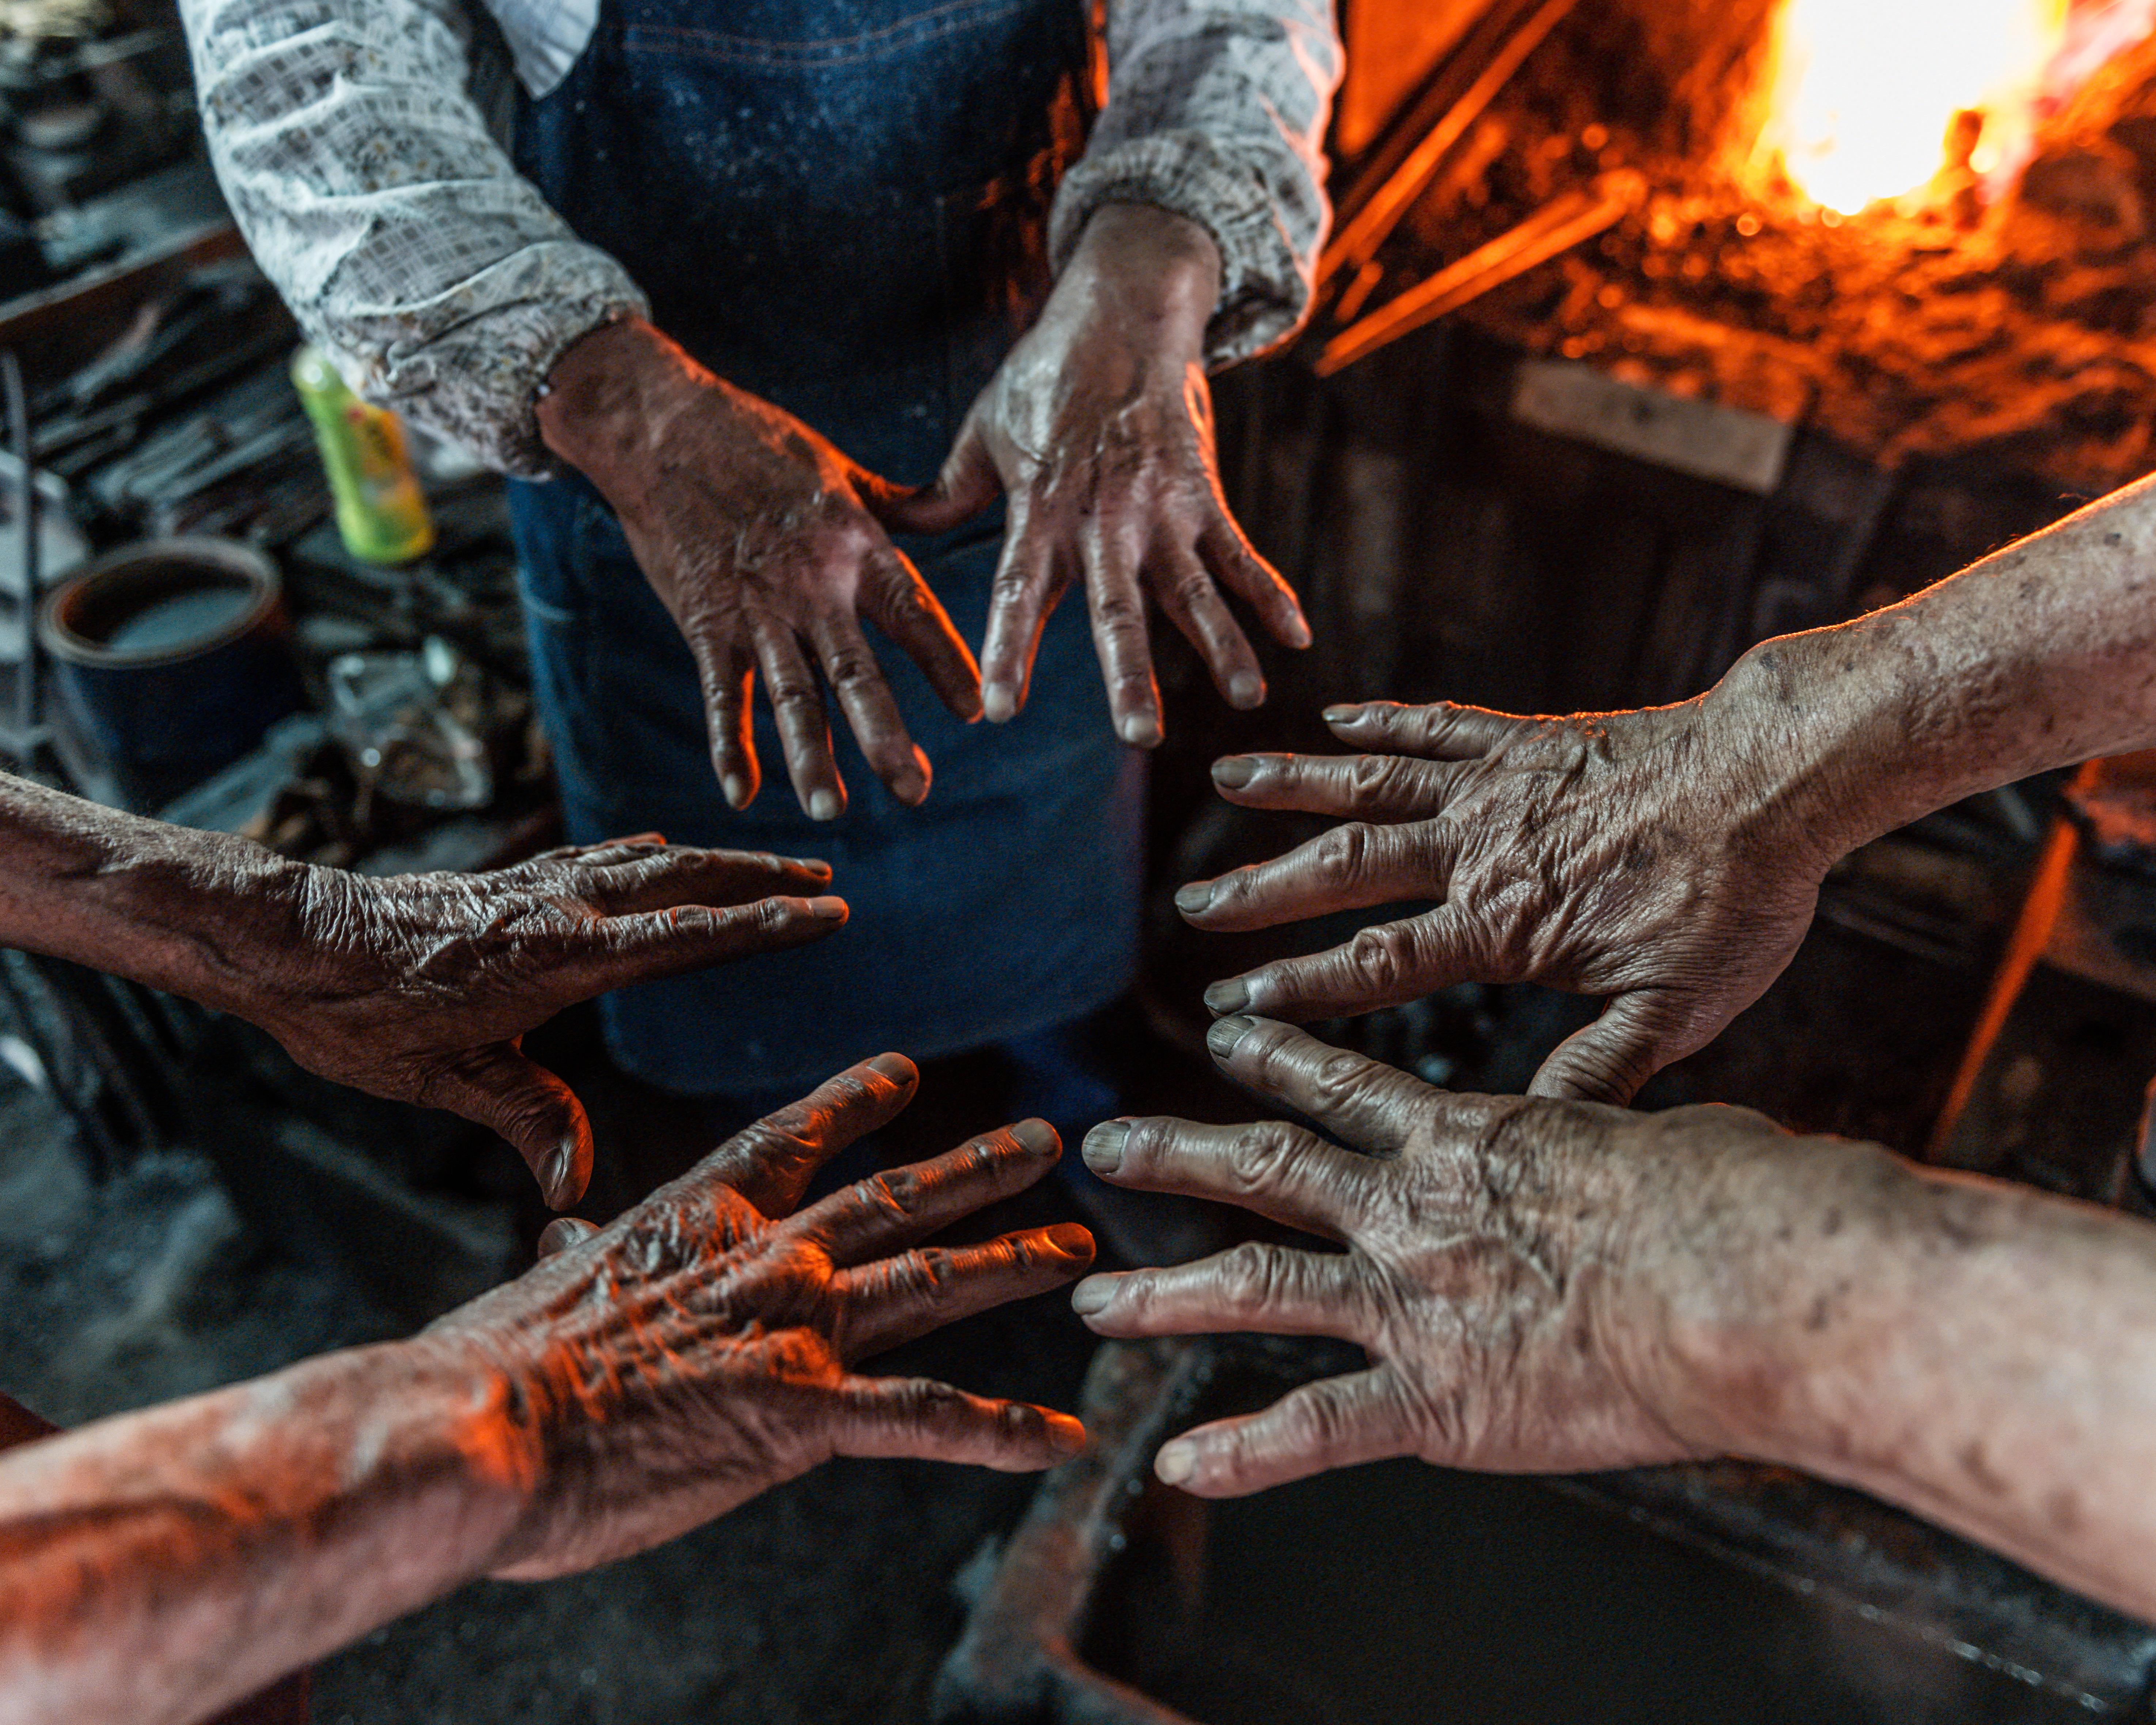 The hands of Noriyuki, Kitai, and Kenji Yoshida, toolmakers and blacksmiths in the town of Shimabara, on the southern island of Kyushu.